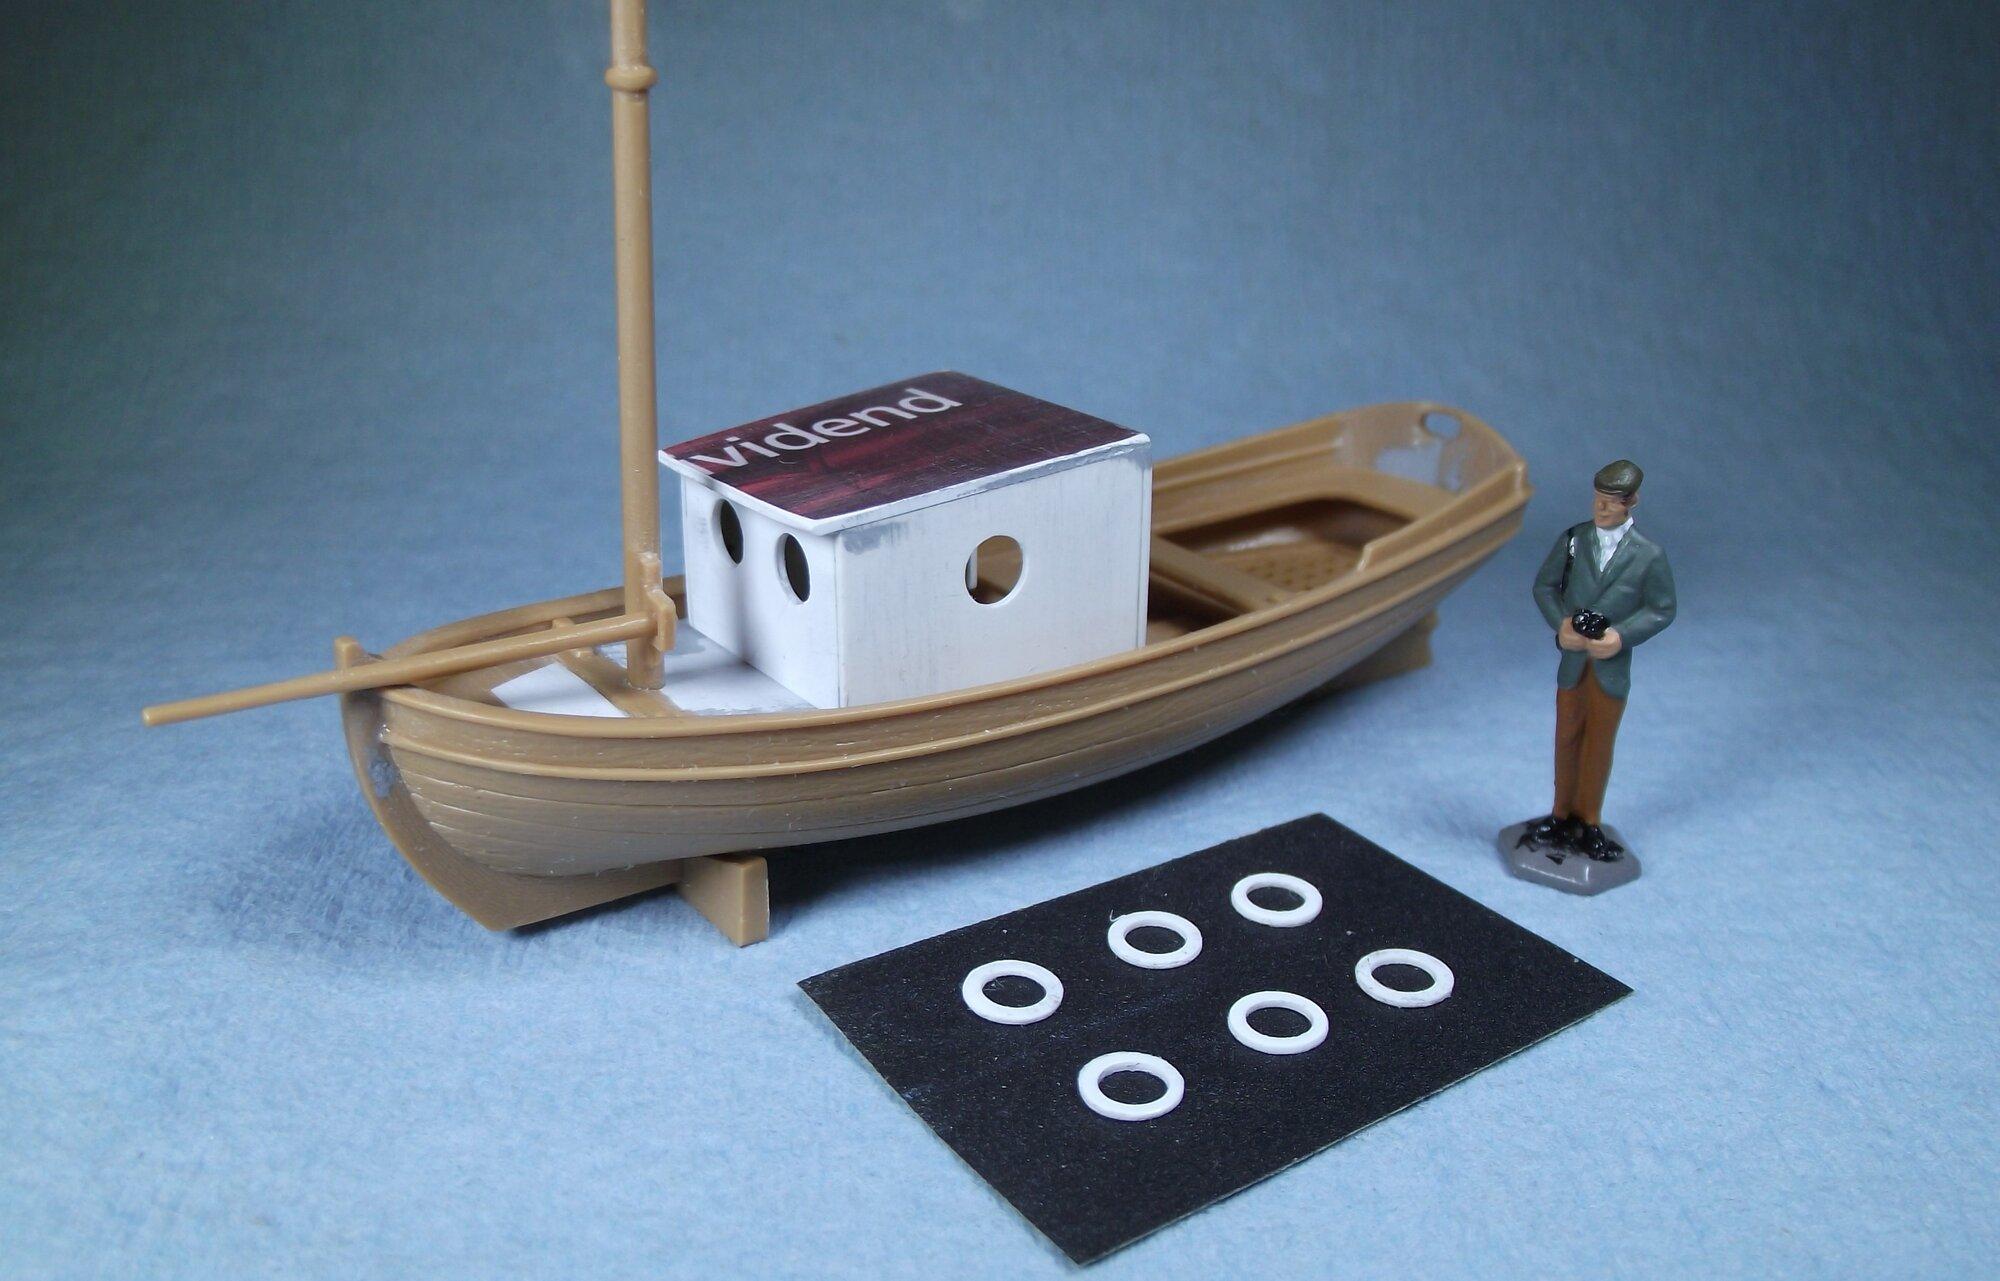 Boat_04-29-2021.jpg